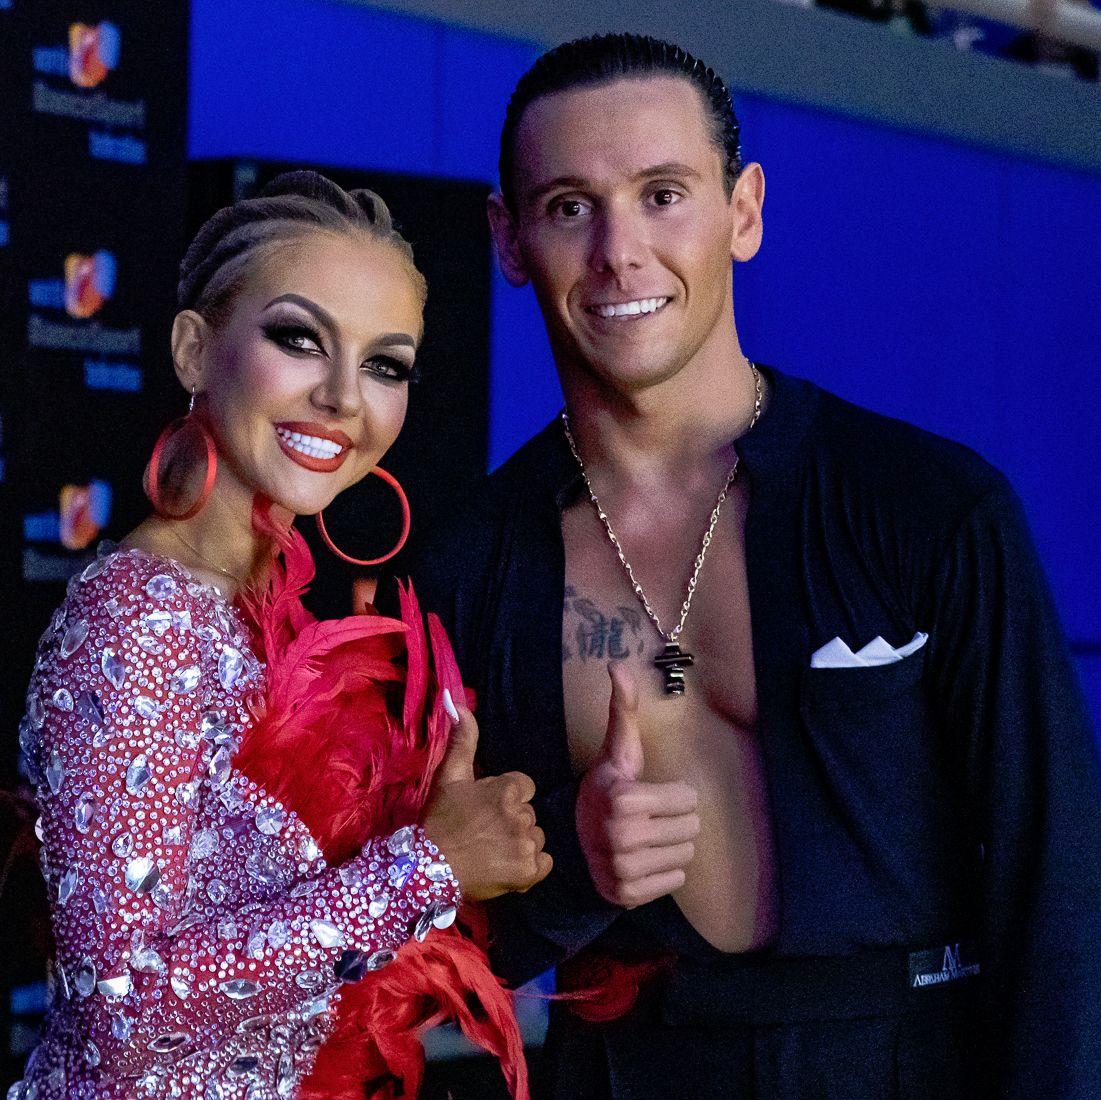 Armen Tsaturyan & Svetlana Gudyno